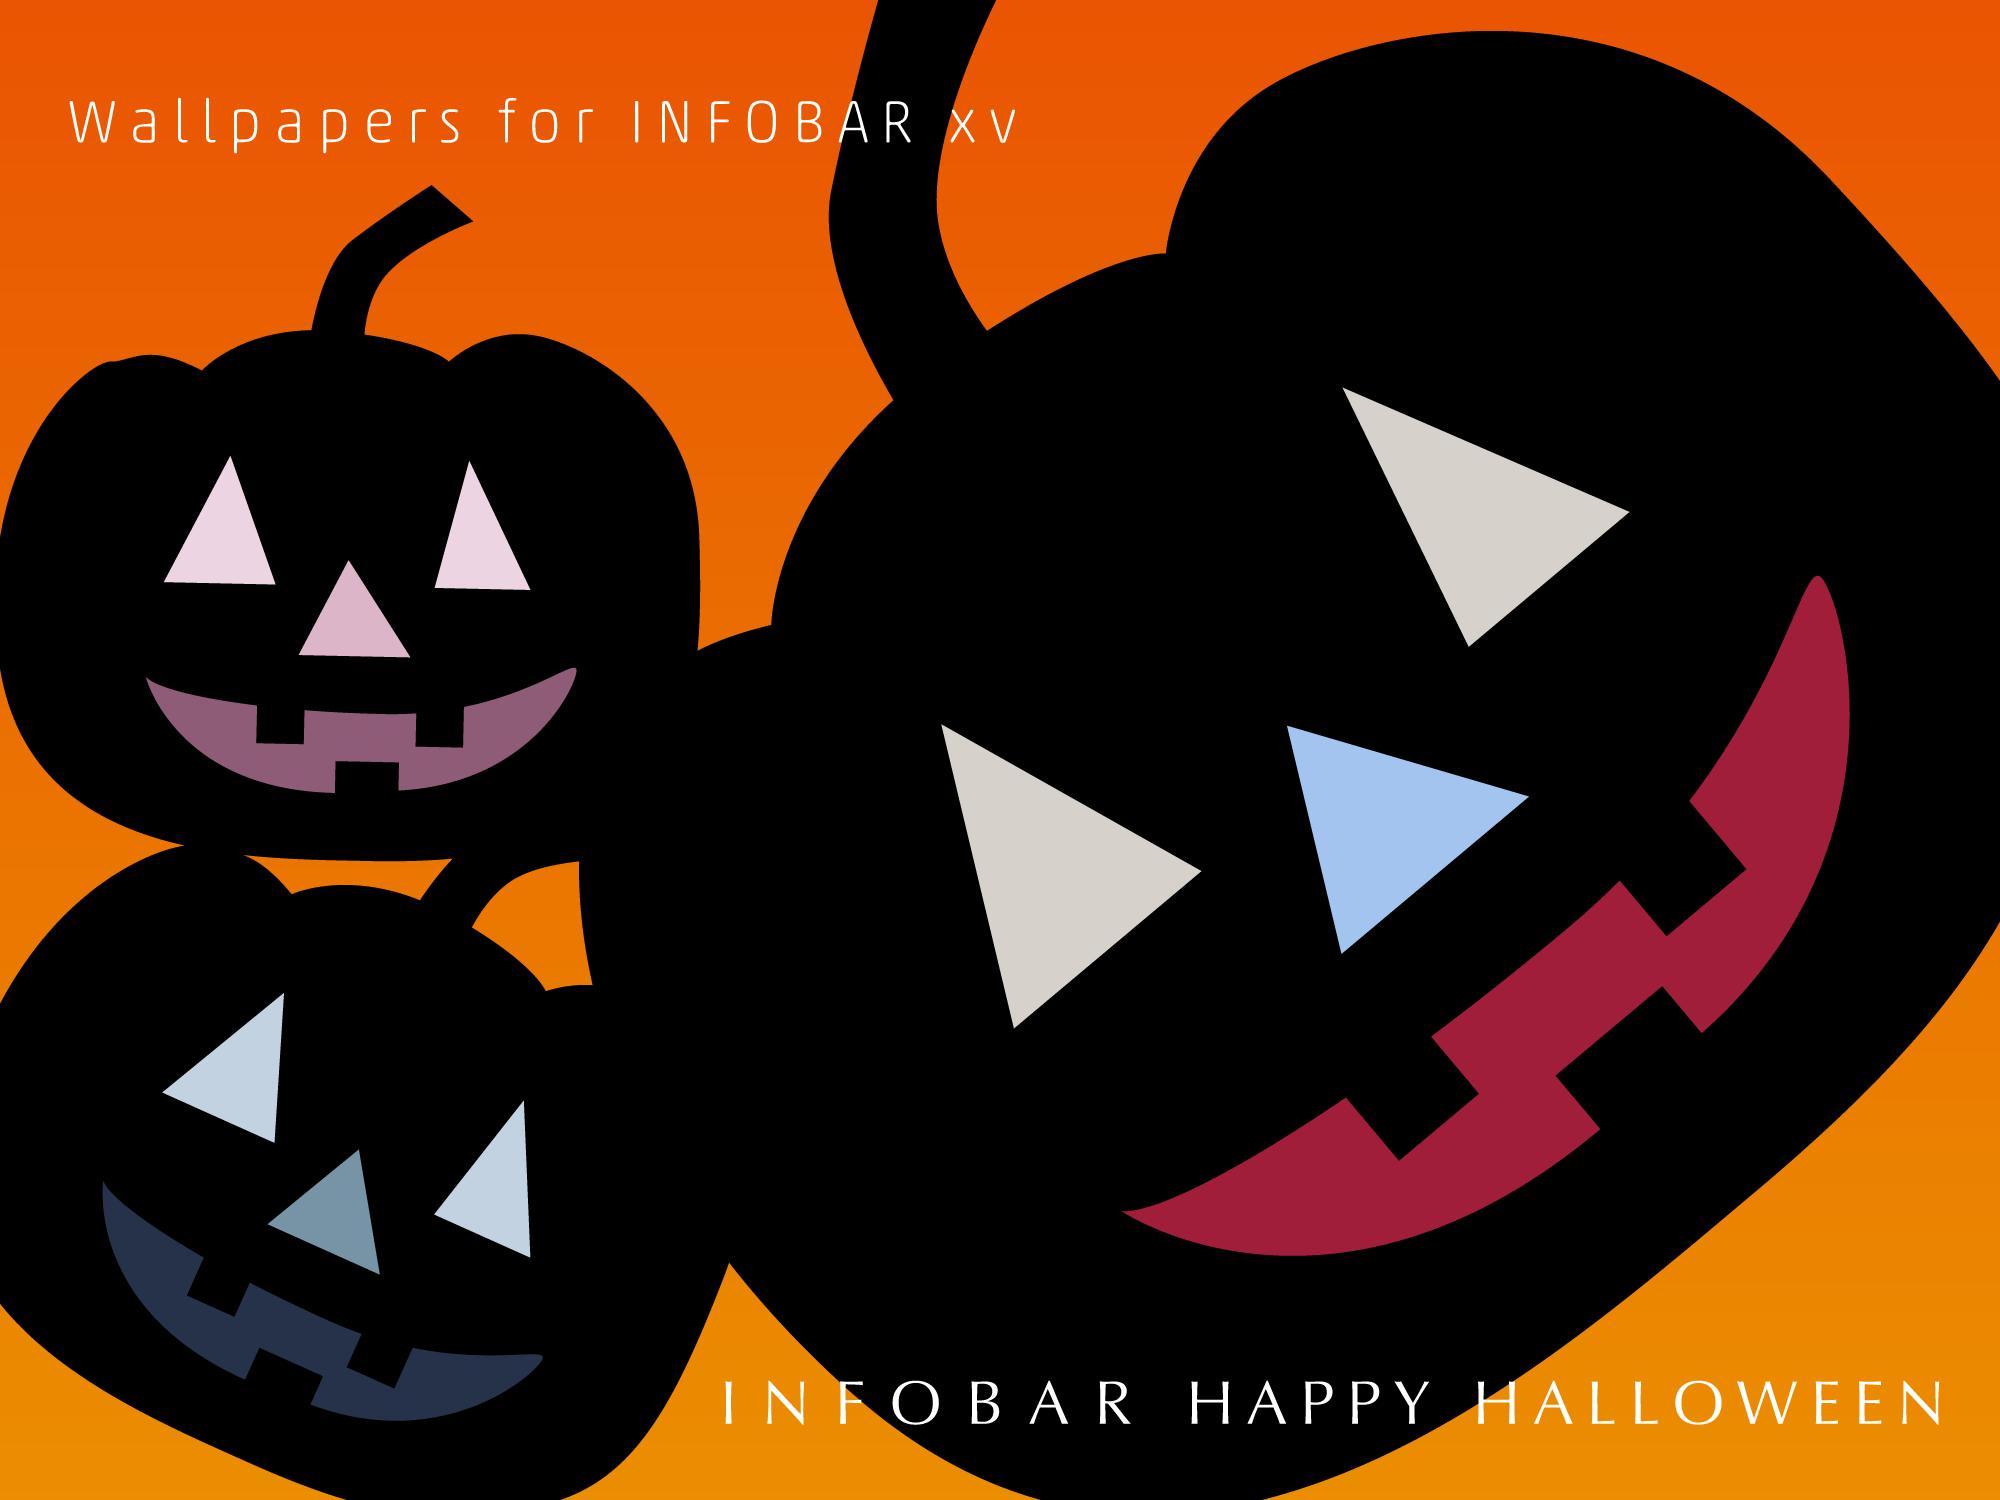 INFOBAR xv用壁紙 | HAPPY HALLOWEEN